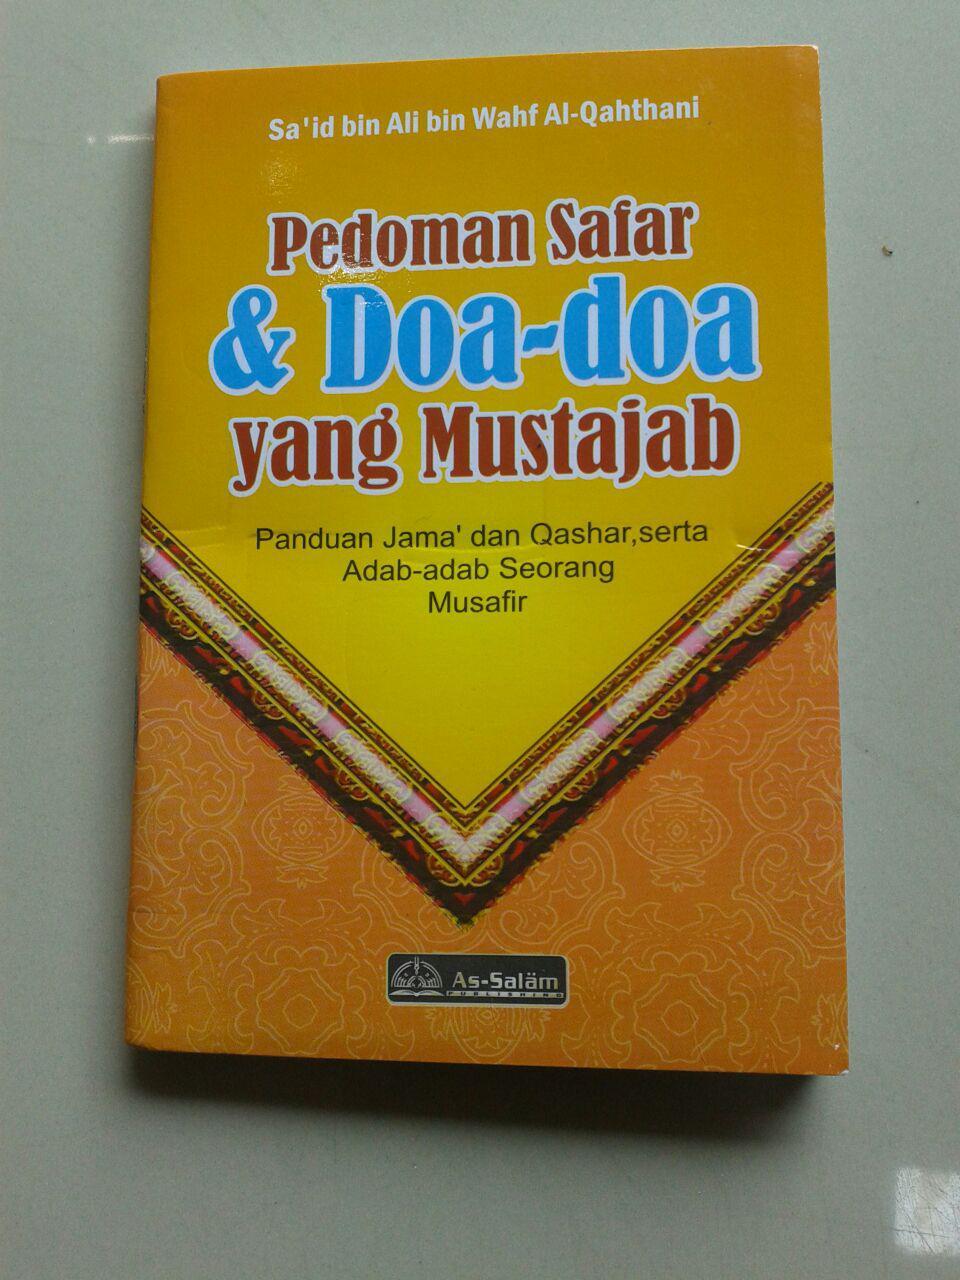 Buku Saku Pedoman Safar Doa Doa Yang Mustajab & Adab Adab Musafir cover